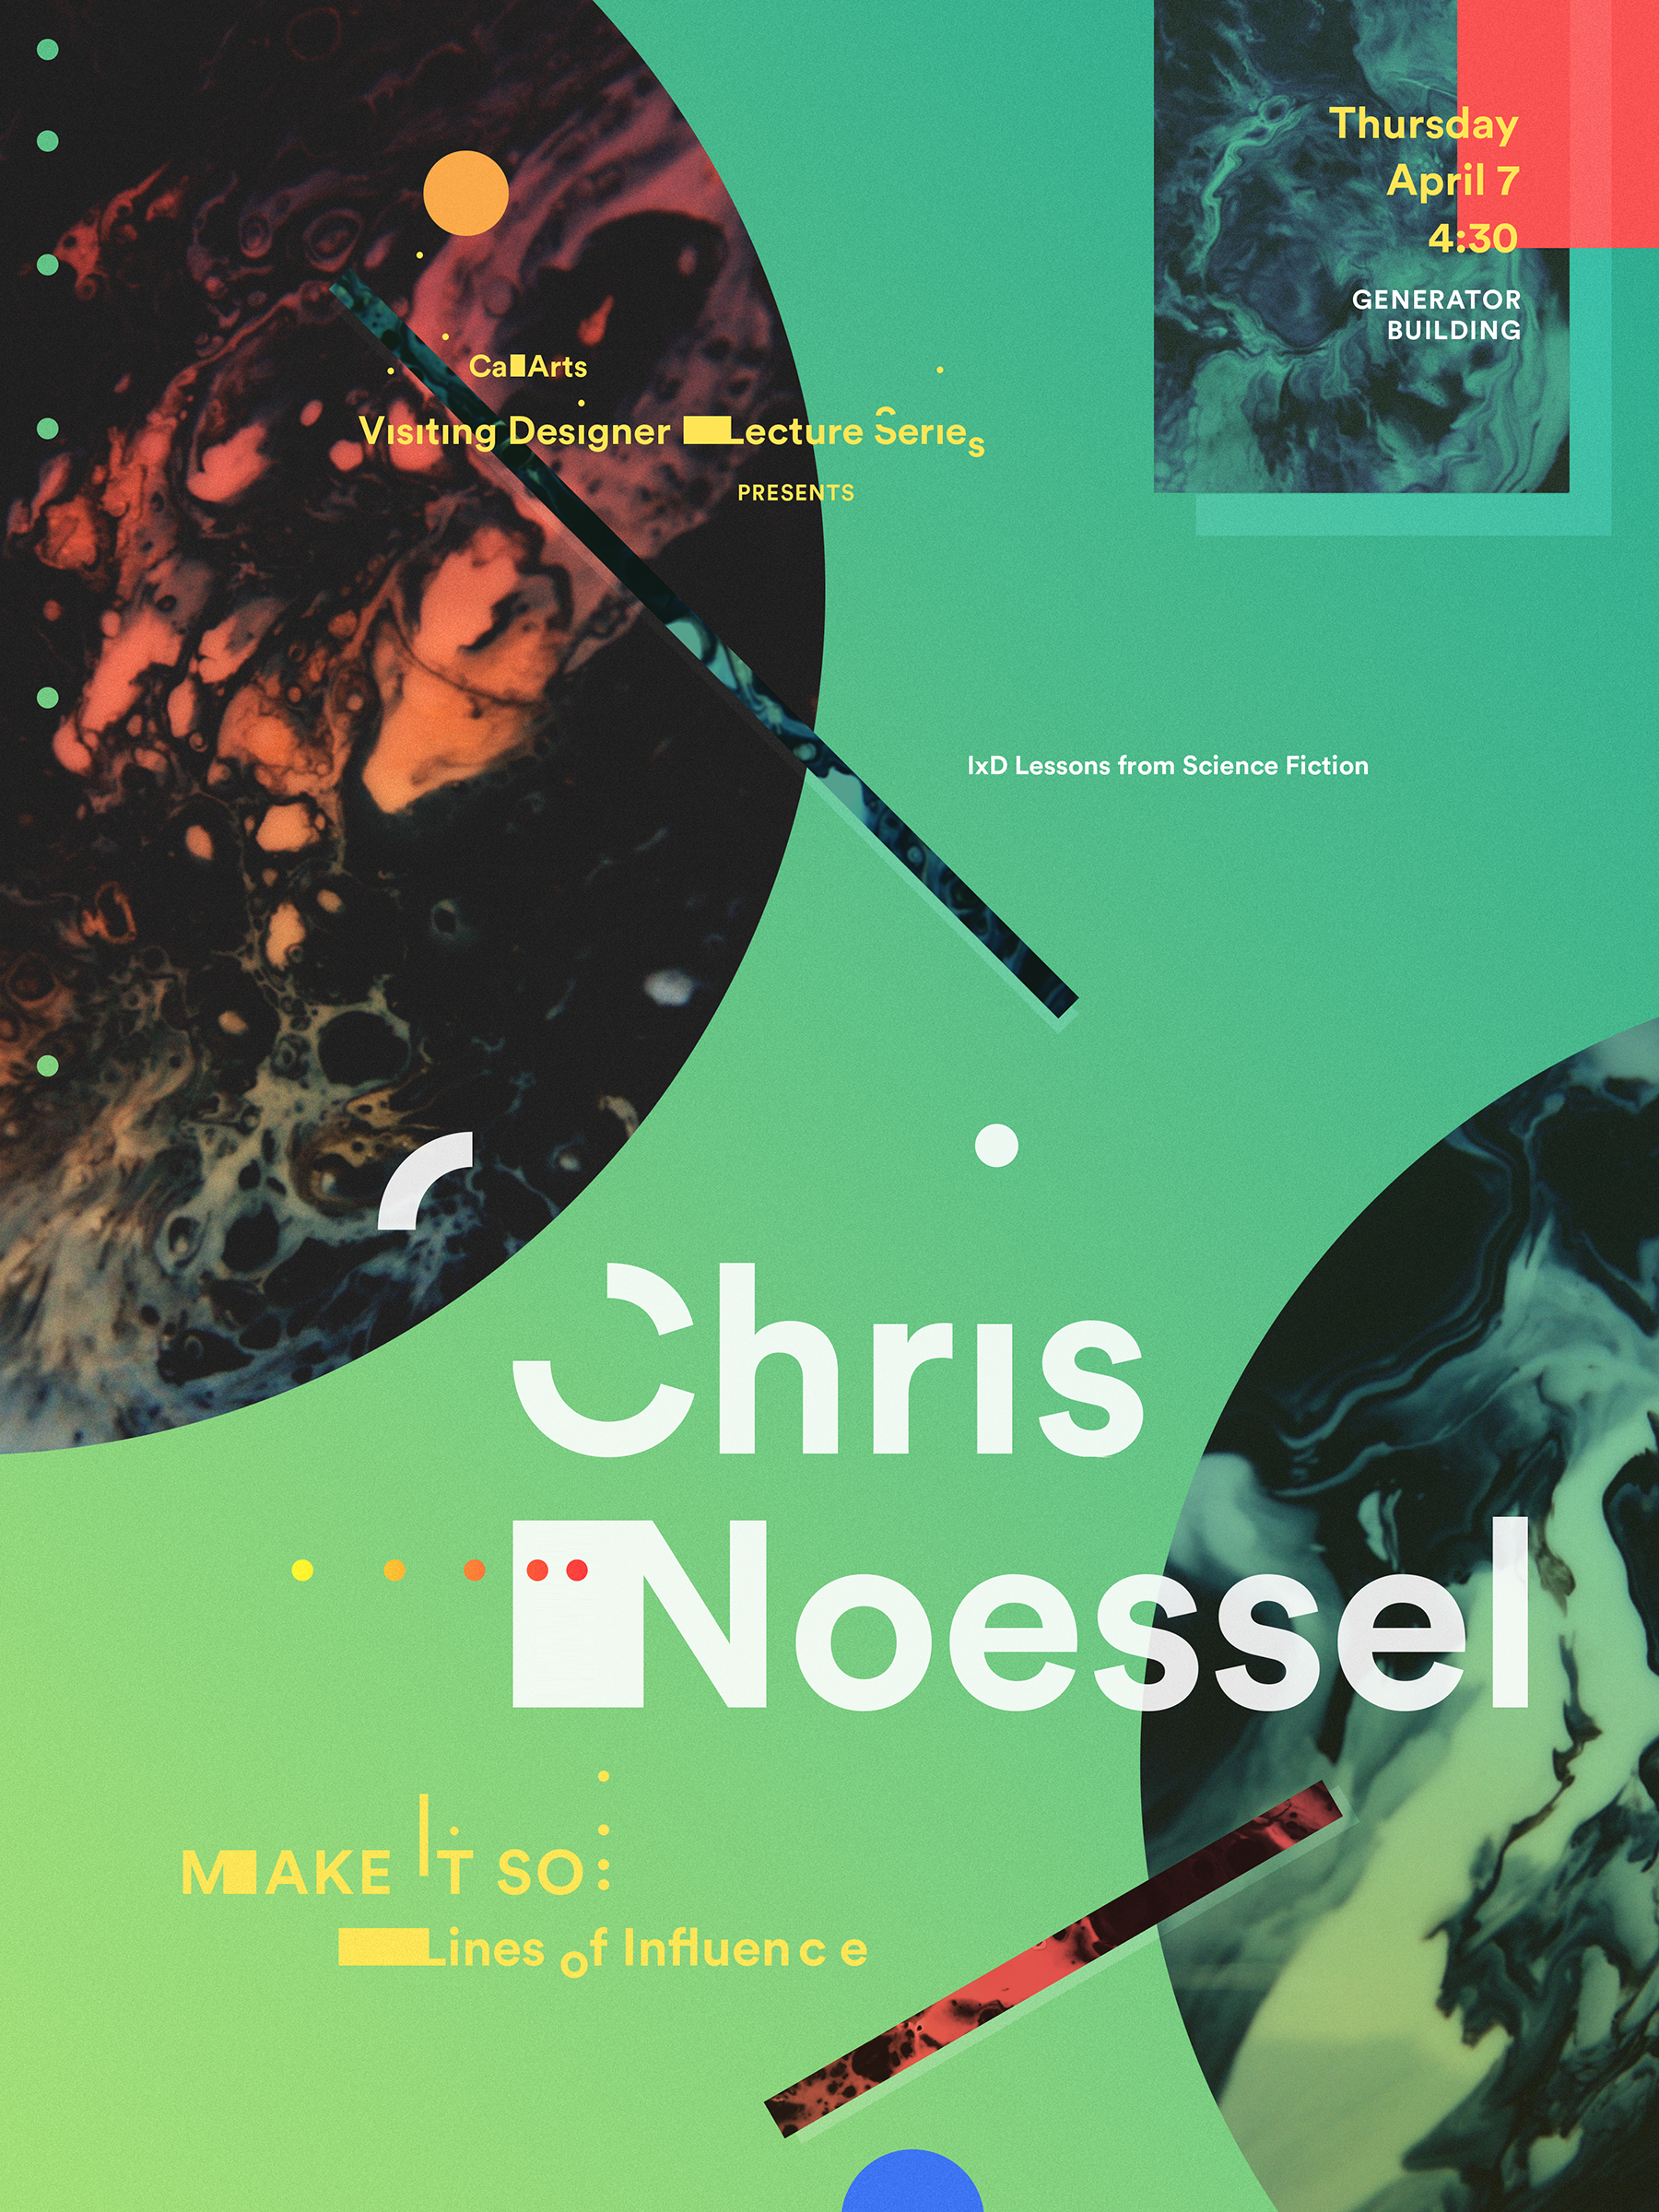 ChrisNoessel_Poster.png